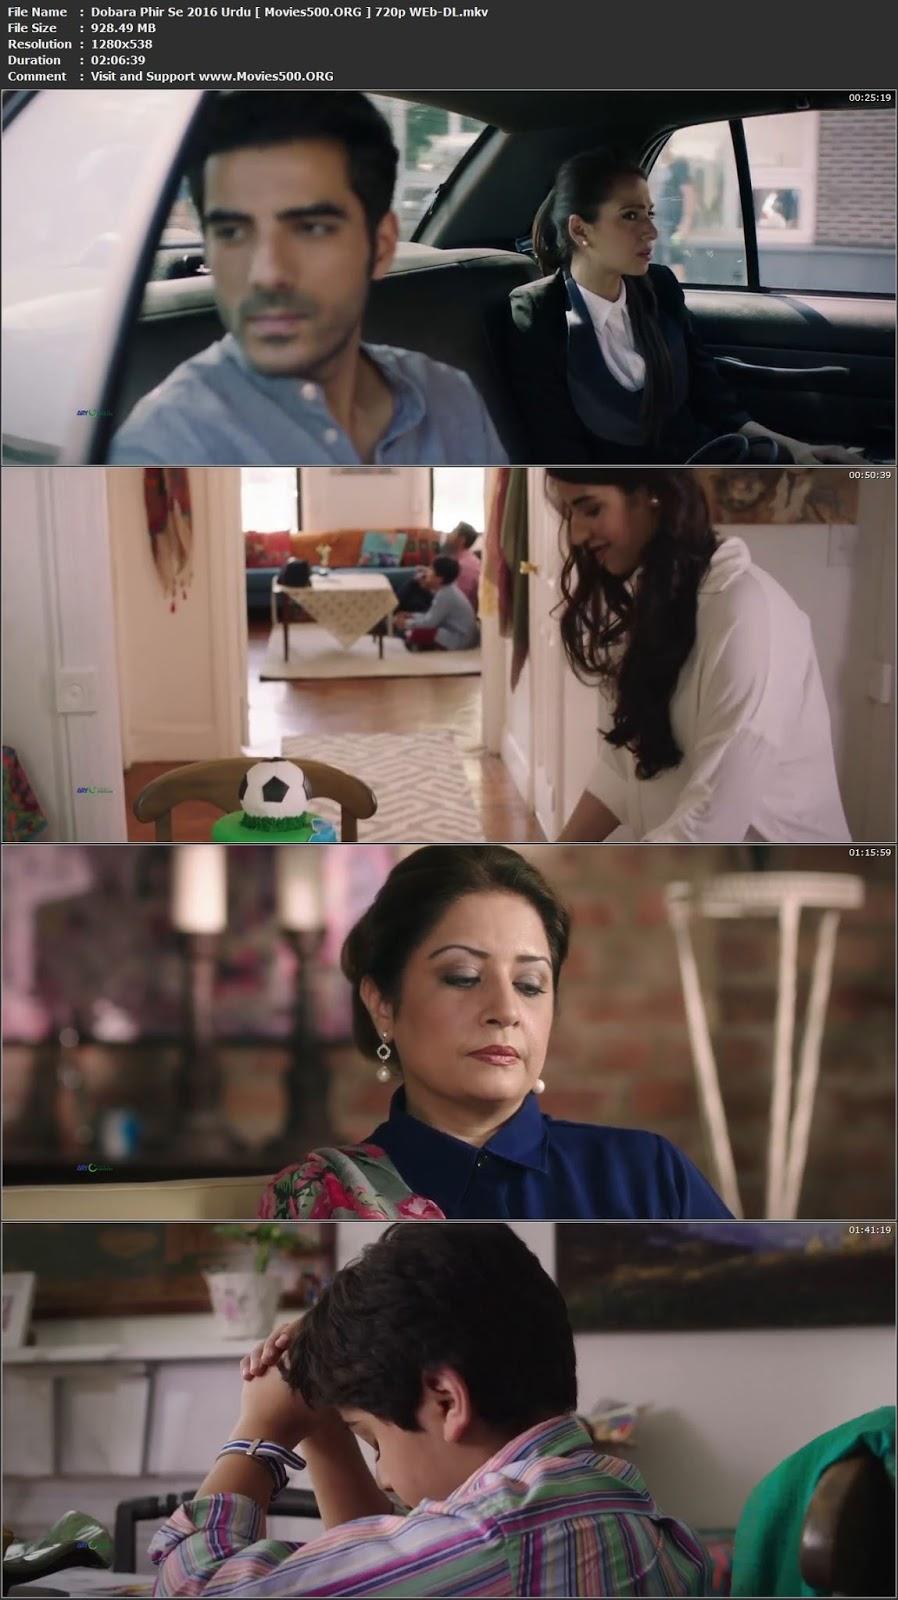 Dobara Phir Se 2016 Urdu Pakistani Download WEB DL 720p at movies500.xyz